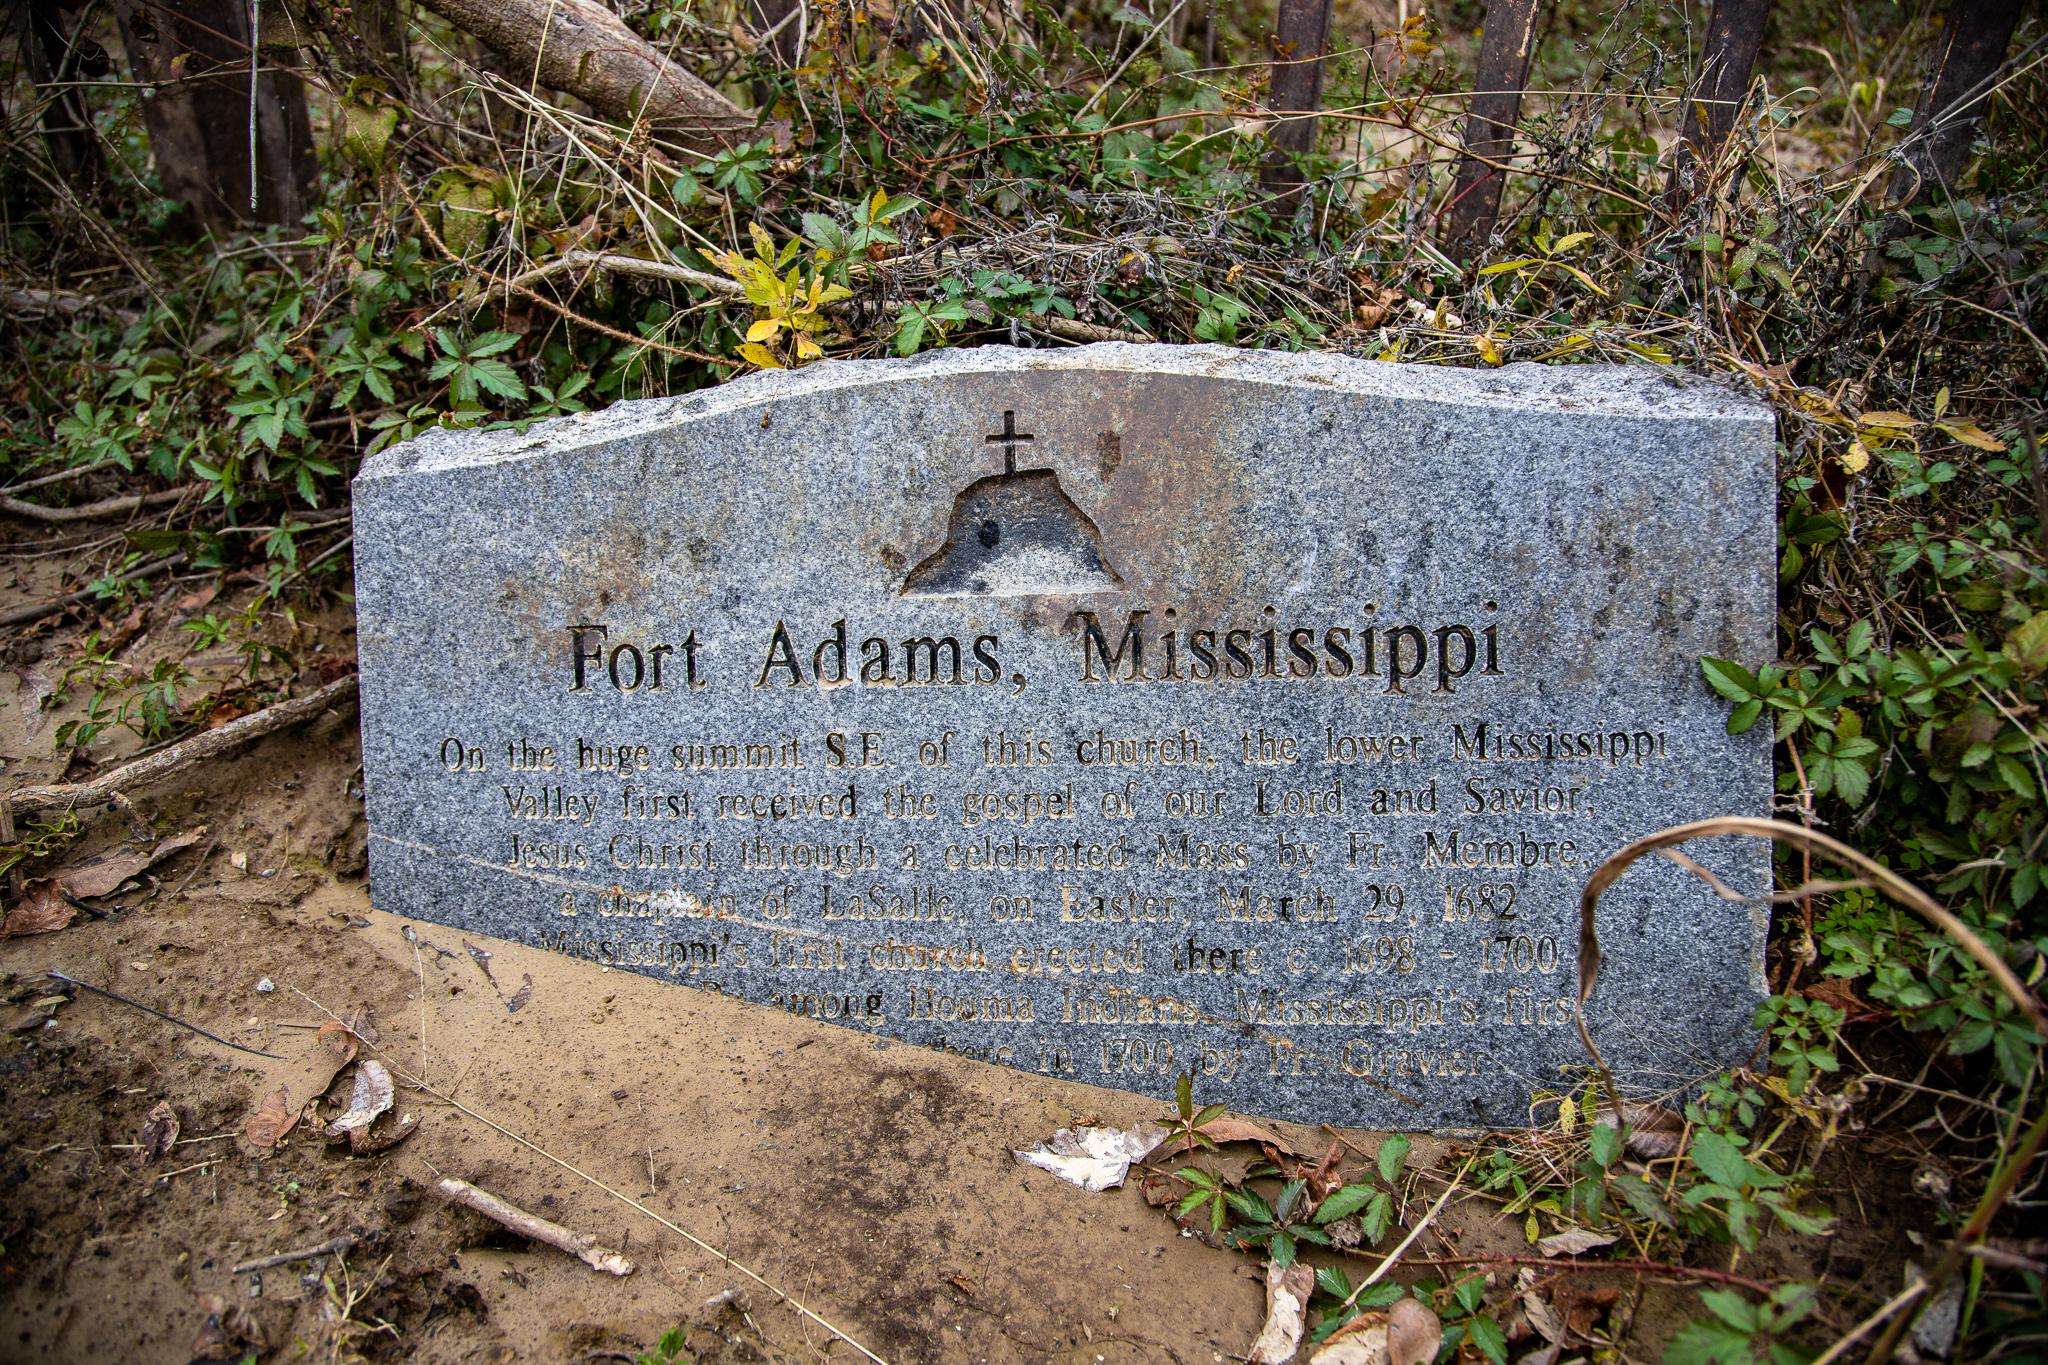 St. Joseph's Fort Adams